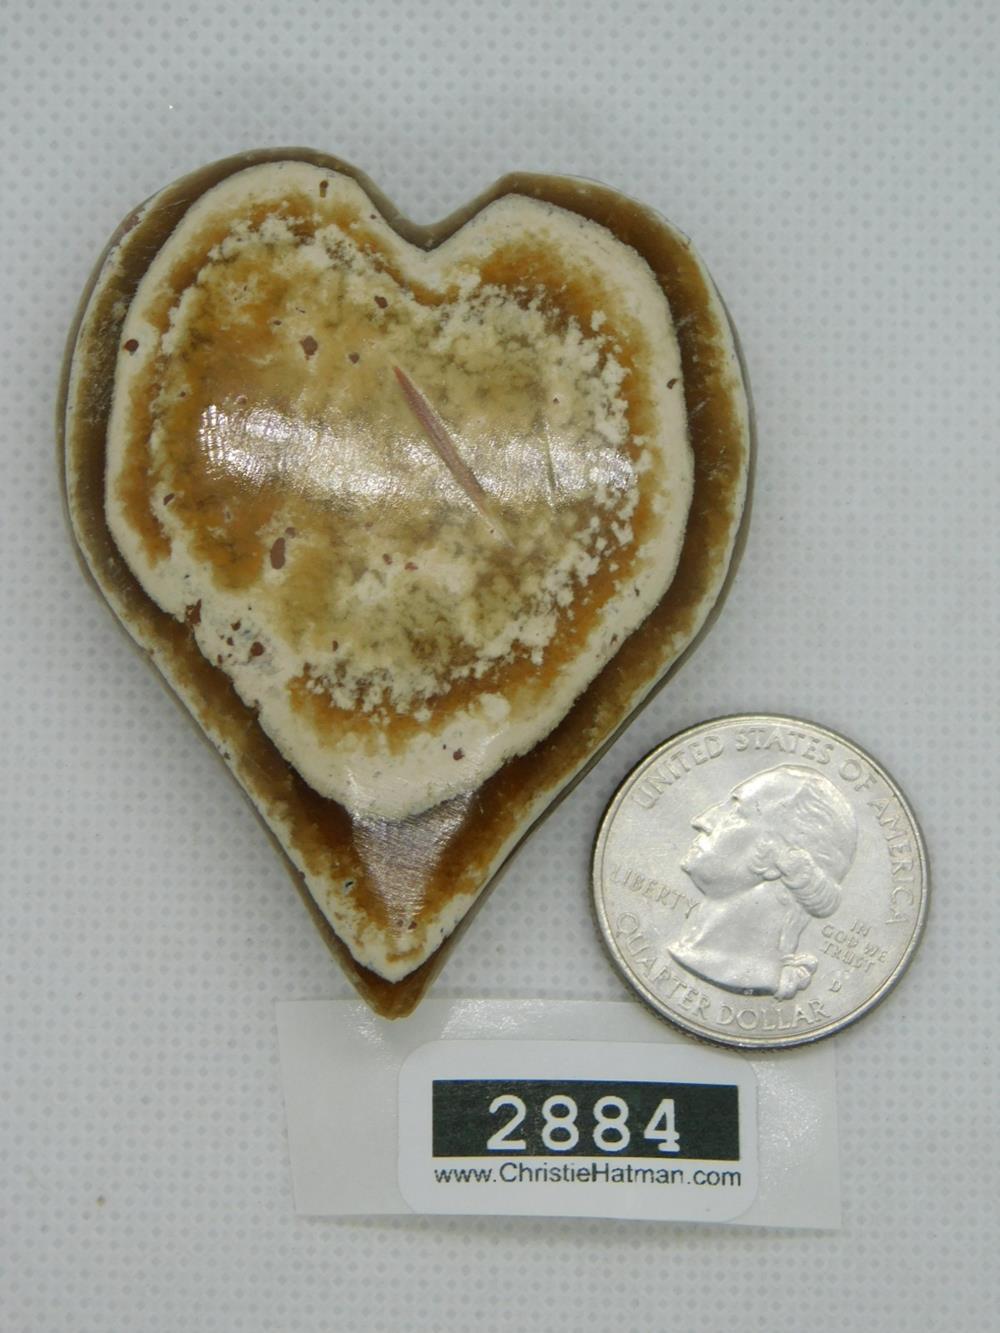 RIBBON BANDED JASPER HEART ROCK STONE LAPIDARY SPECIMEN